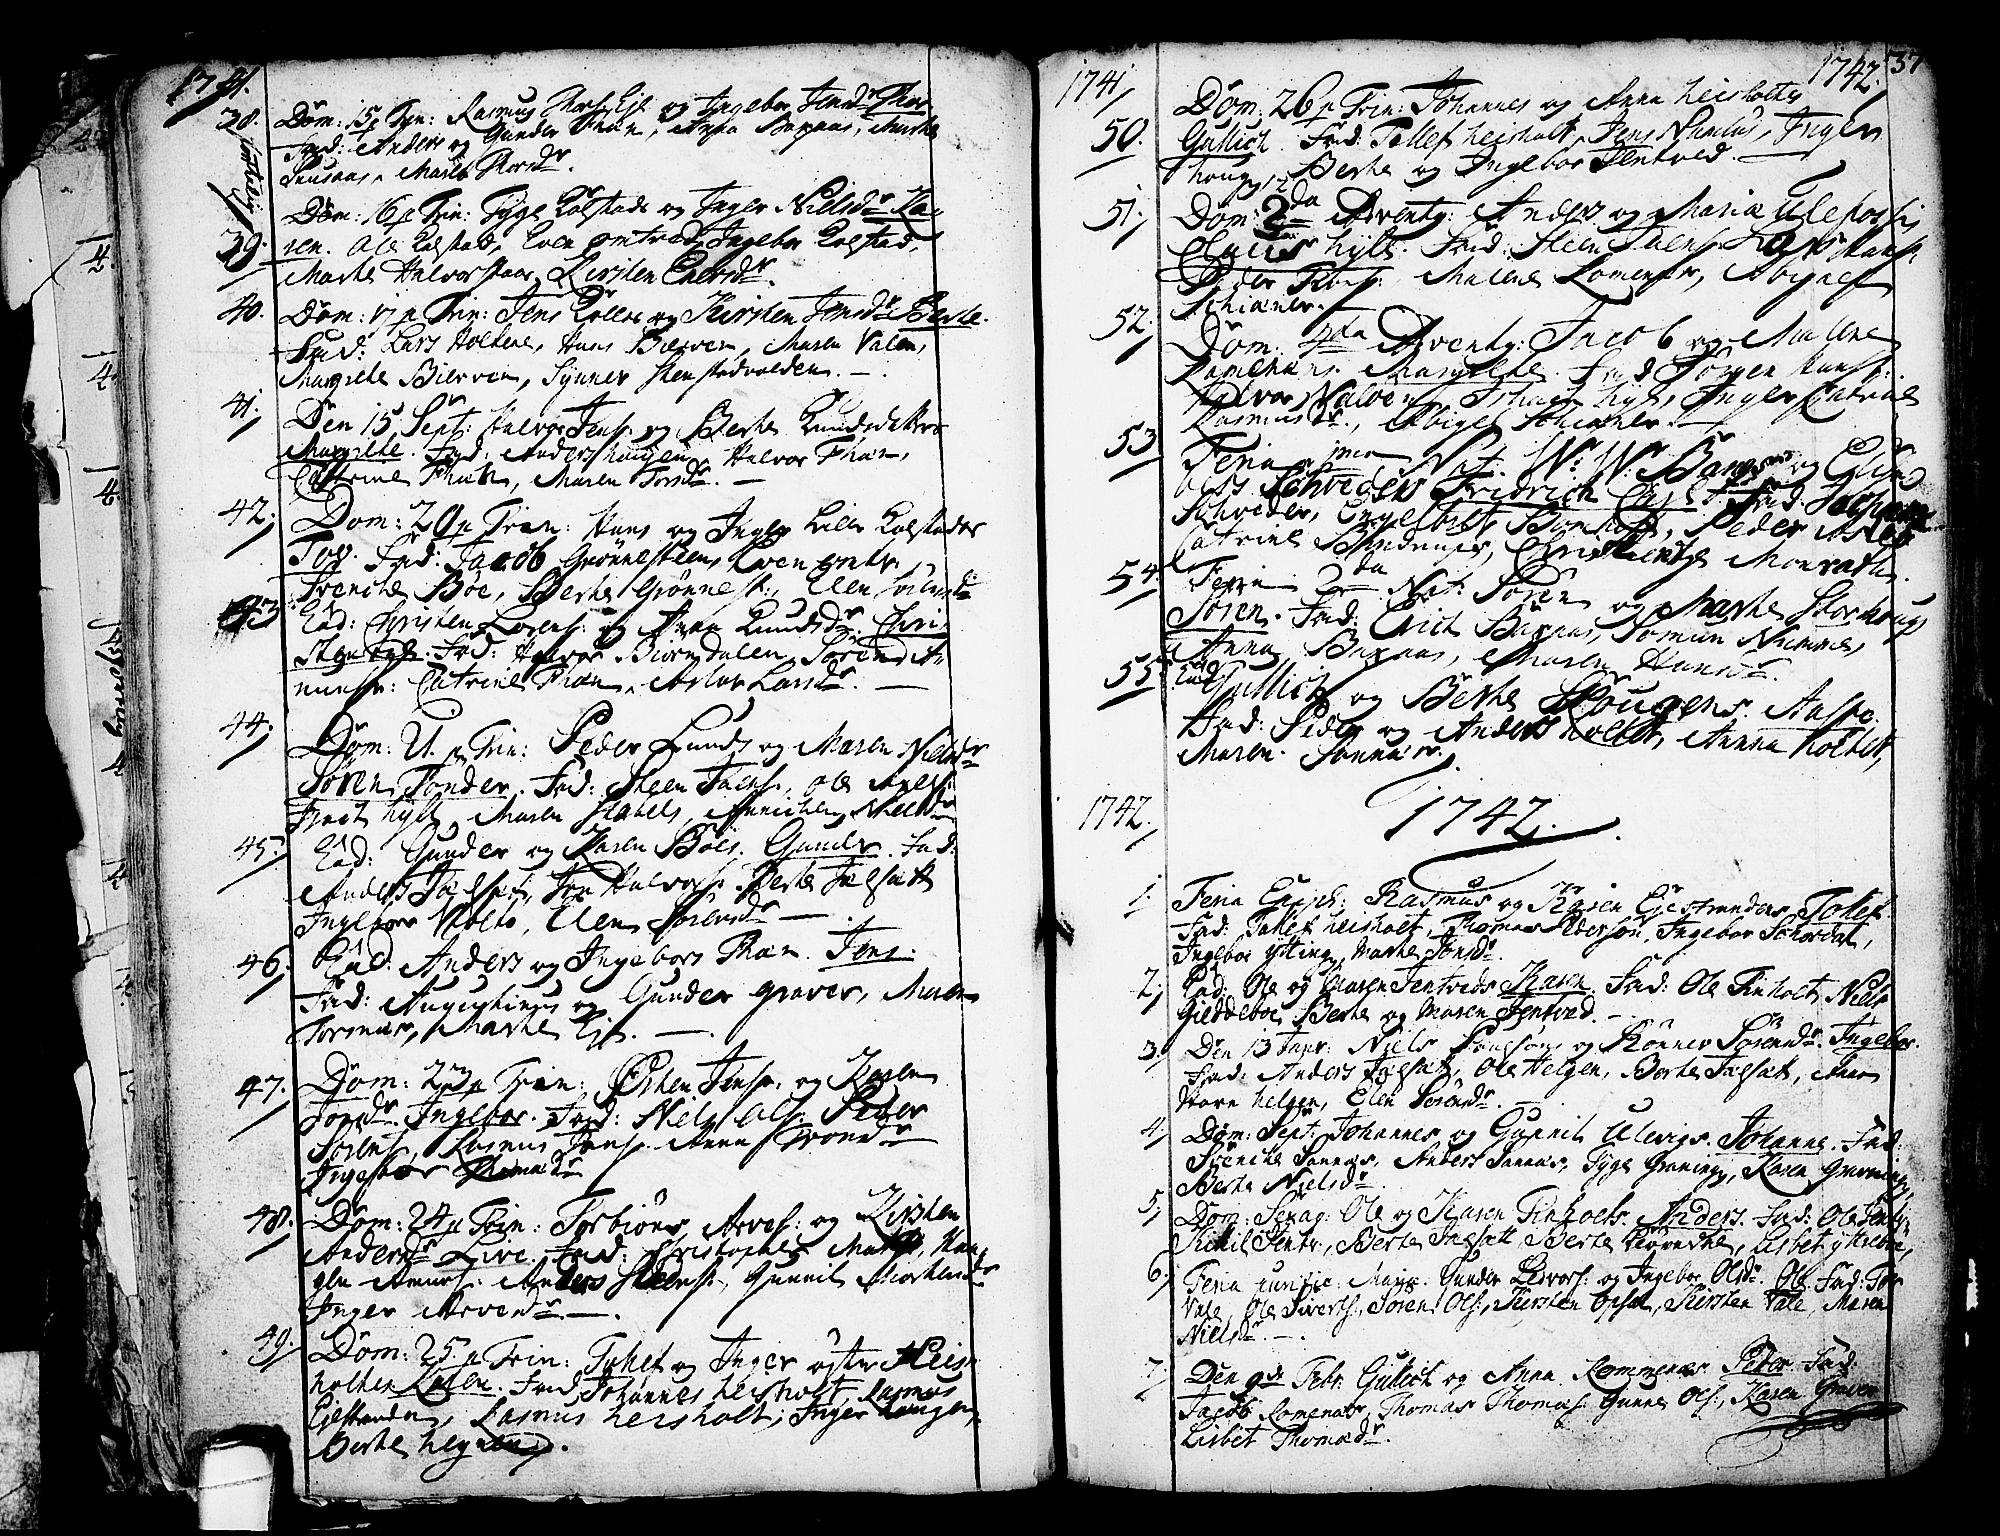 SAKO, Holla kirkebøker, F/Fa/L0001: Ministerialbok nr. 1, 1717-1779, s. 37